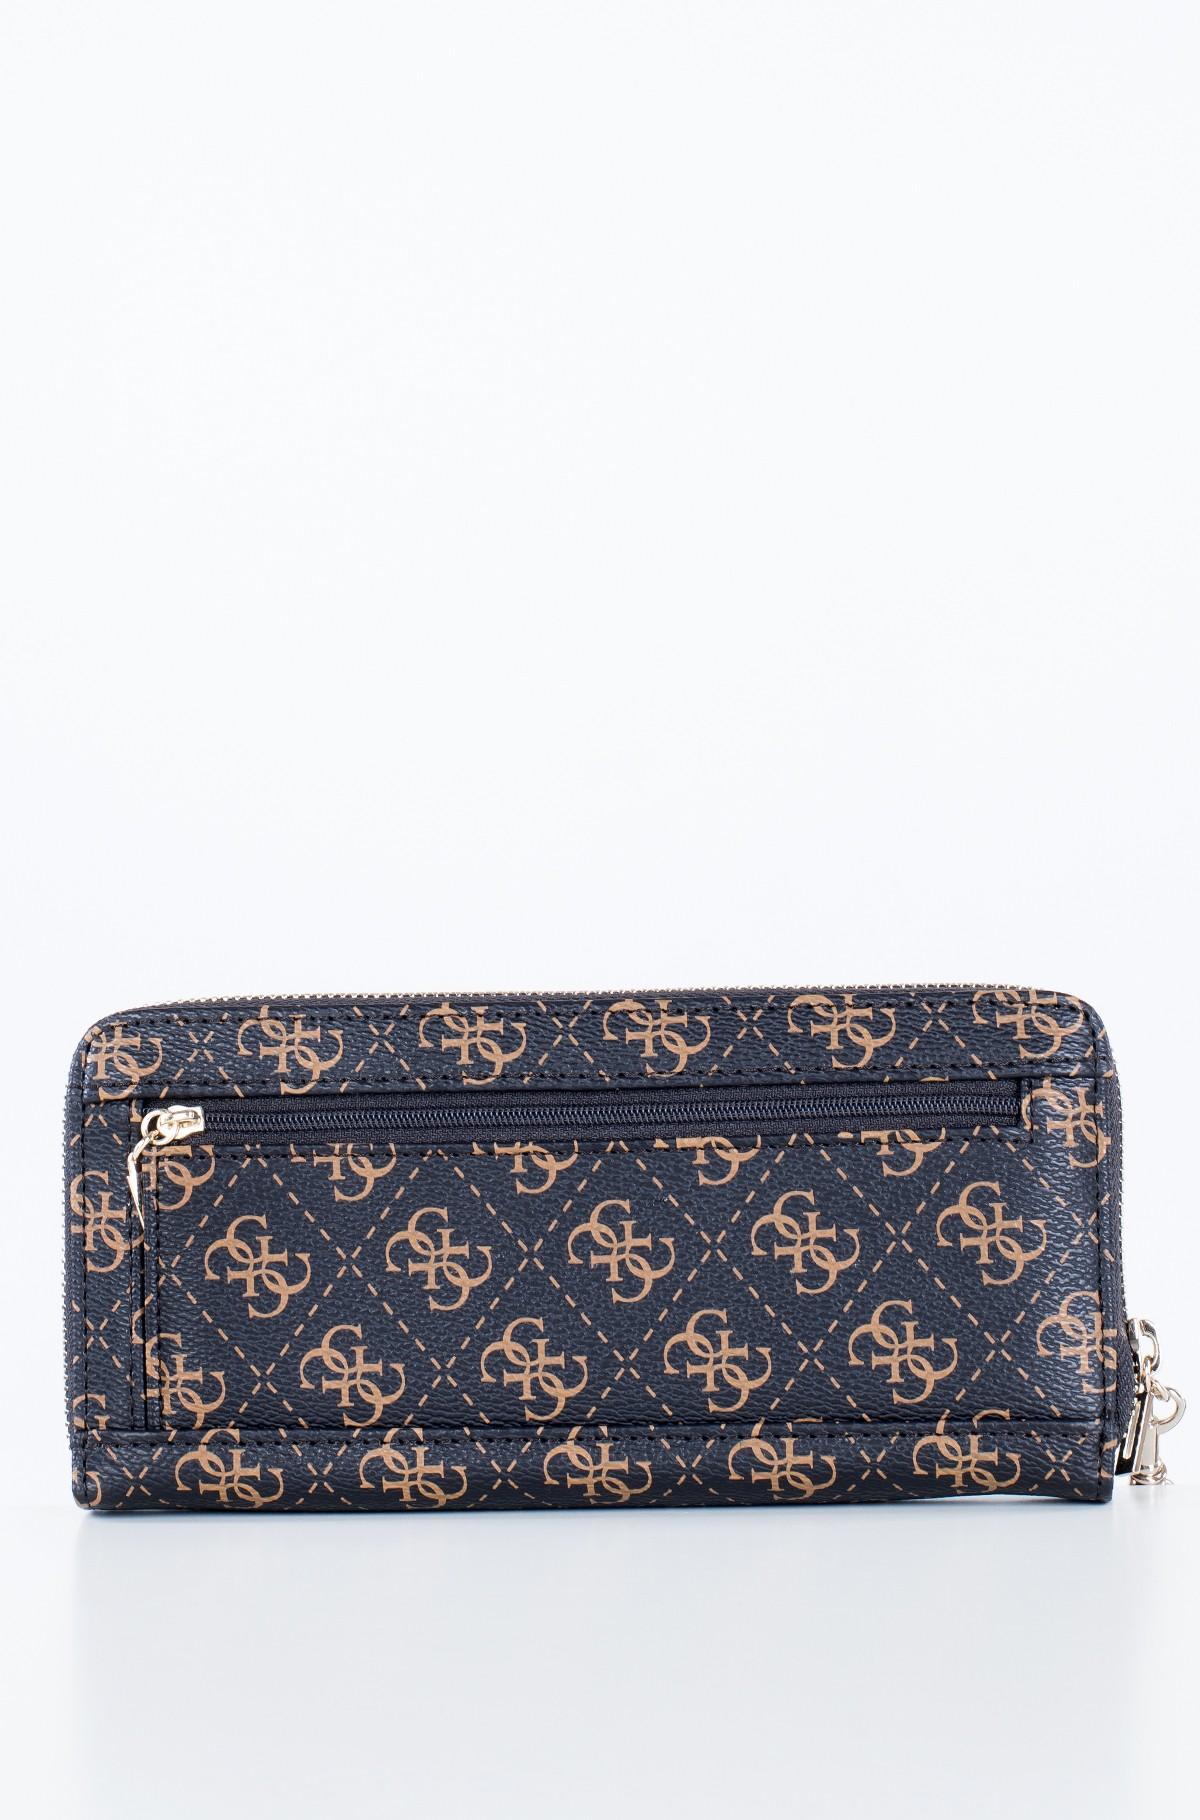 Wallet SWSG76 71460-full-2